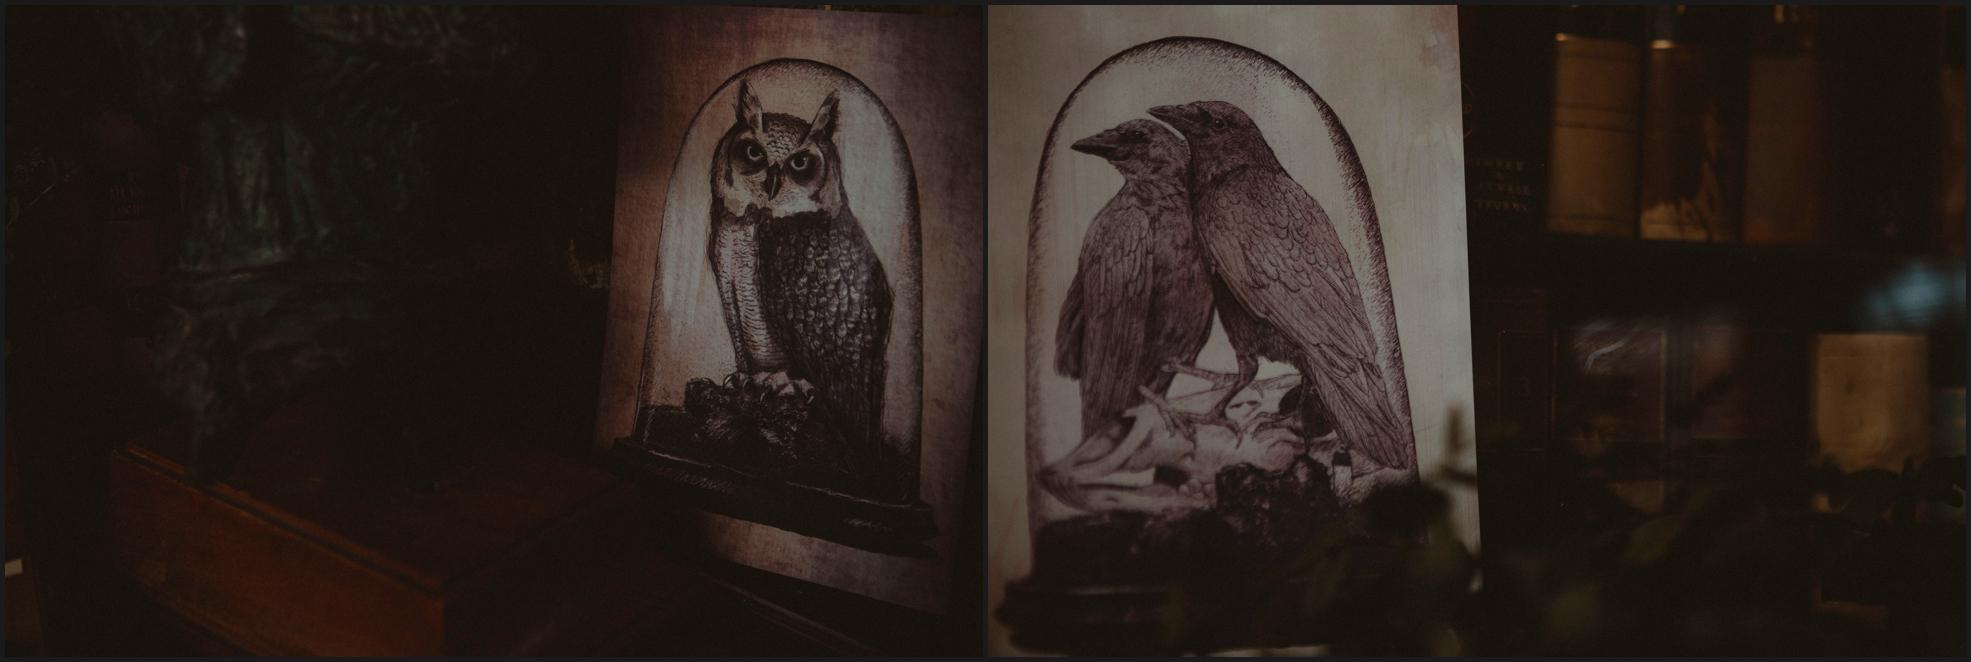 stationary, wedding, owl, crow, wedding, gothic, raven, London